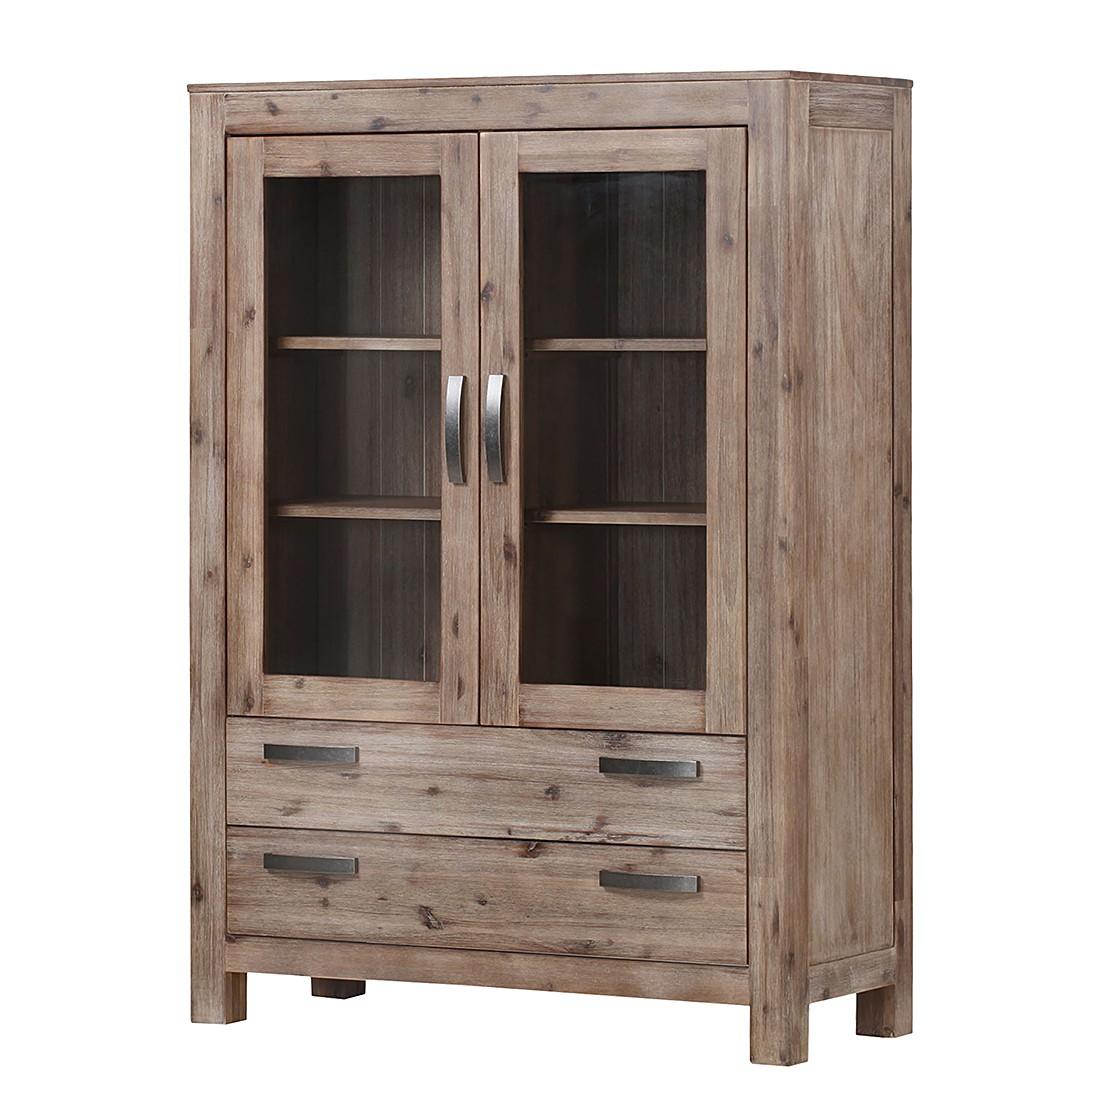 82429003307102 eckschrank k che vitrine. Black Bedroom Furniture Sets. Home Design Ideas